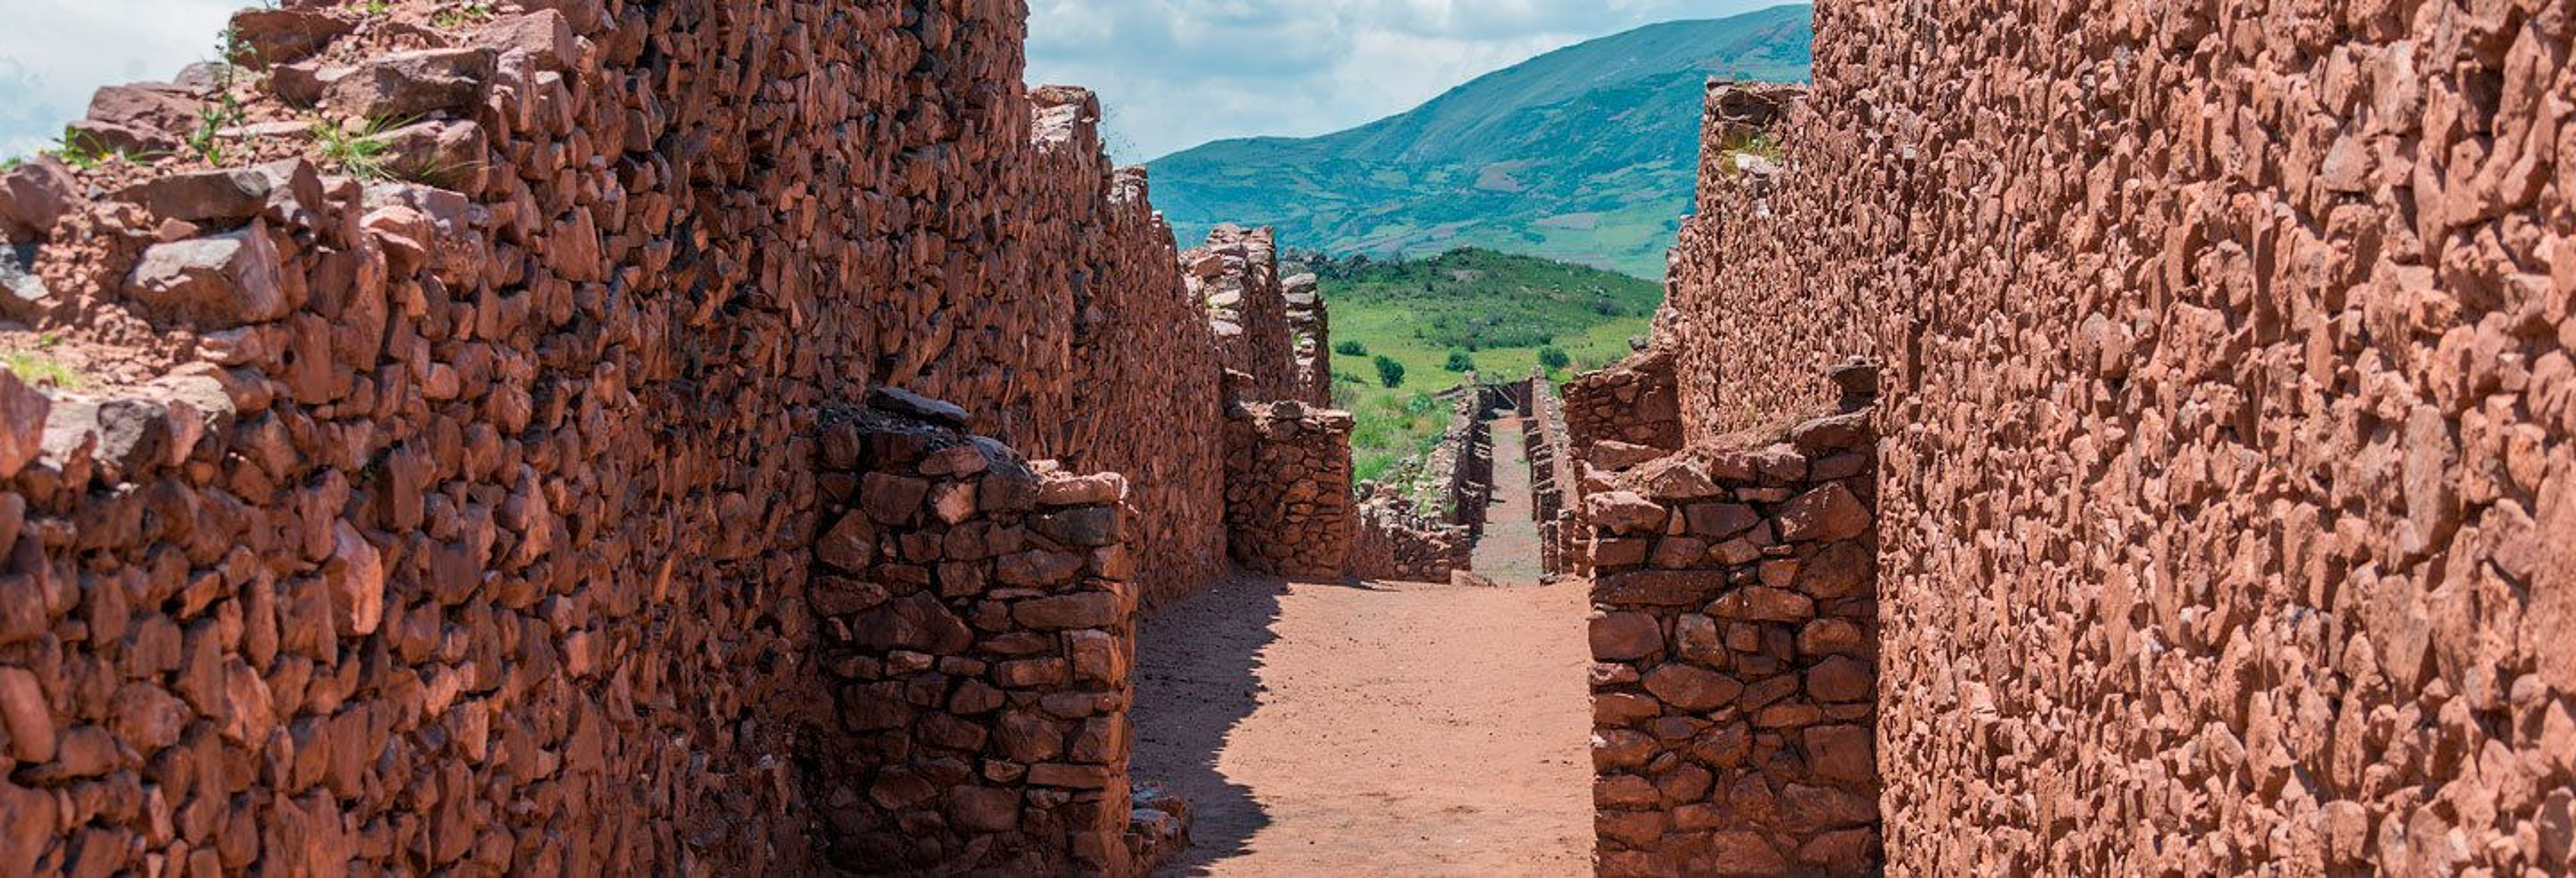 Excursión a Tipón, Pikillacta y Andahuaylillas